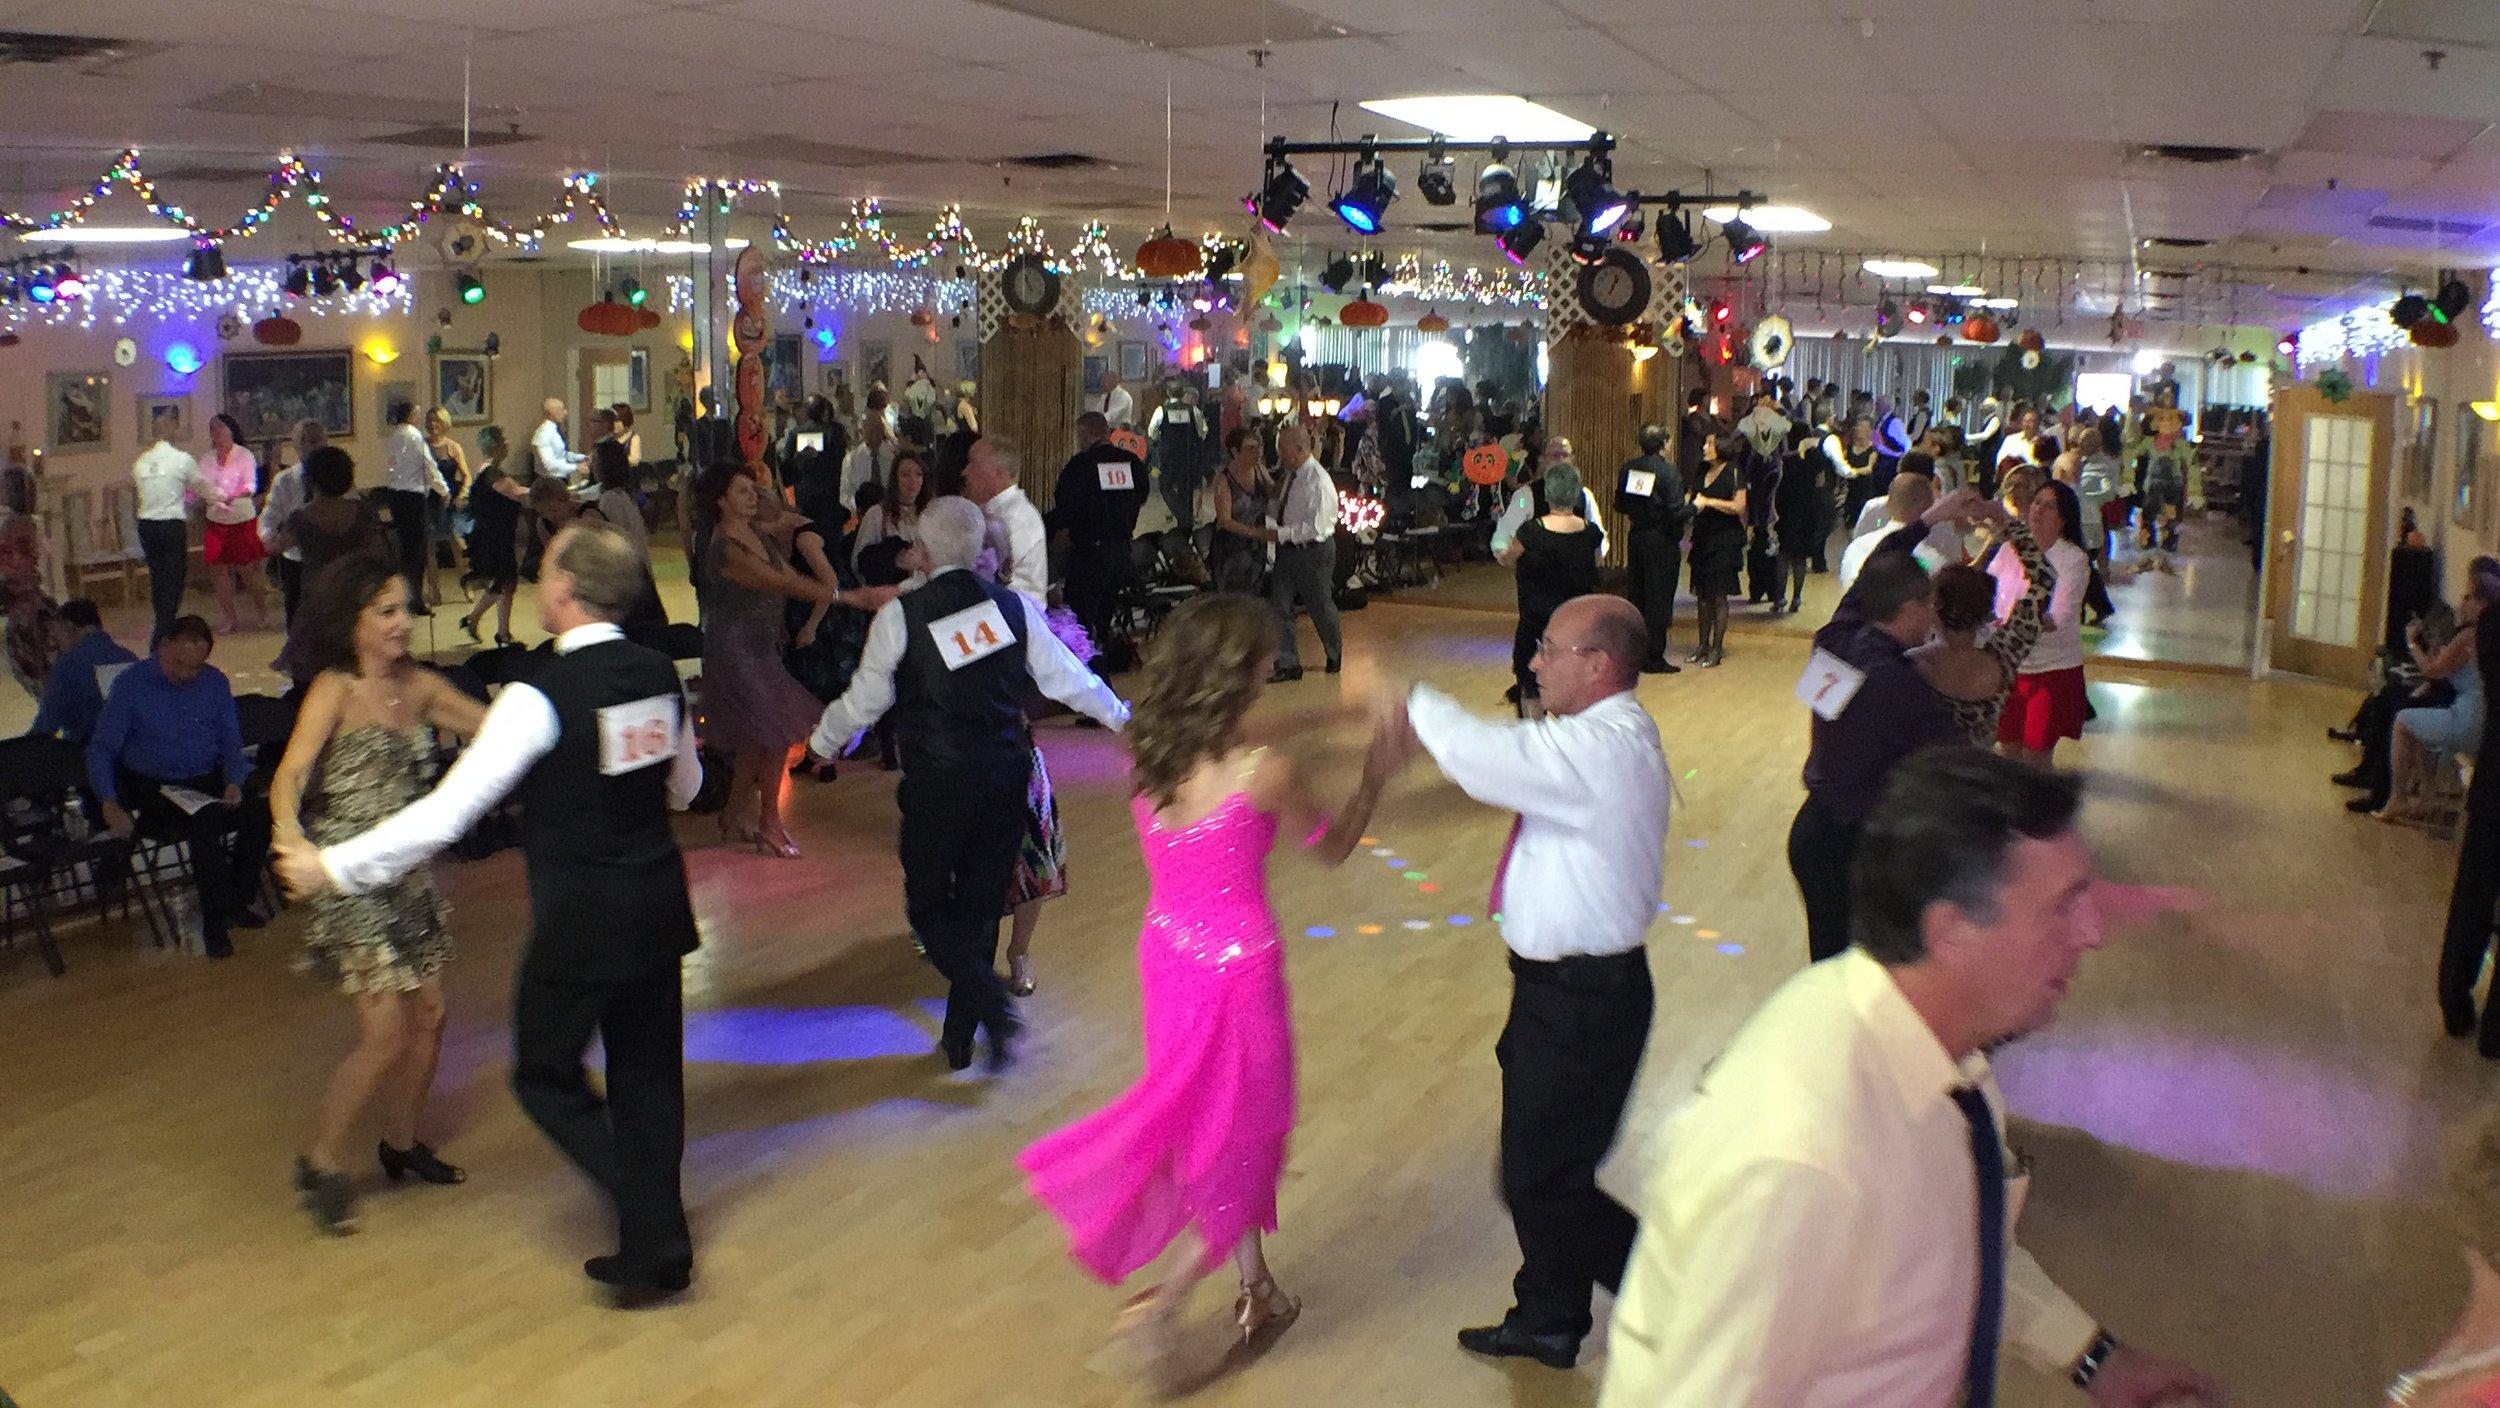 Dance couples compete at Quick Quick Slow Annual Interstudio Ballroom Battle